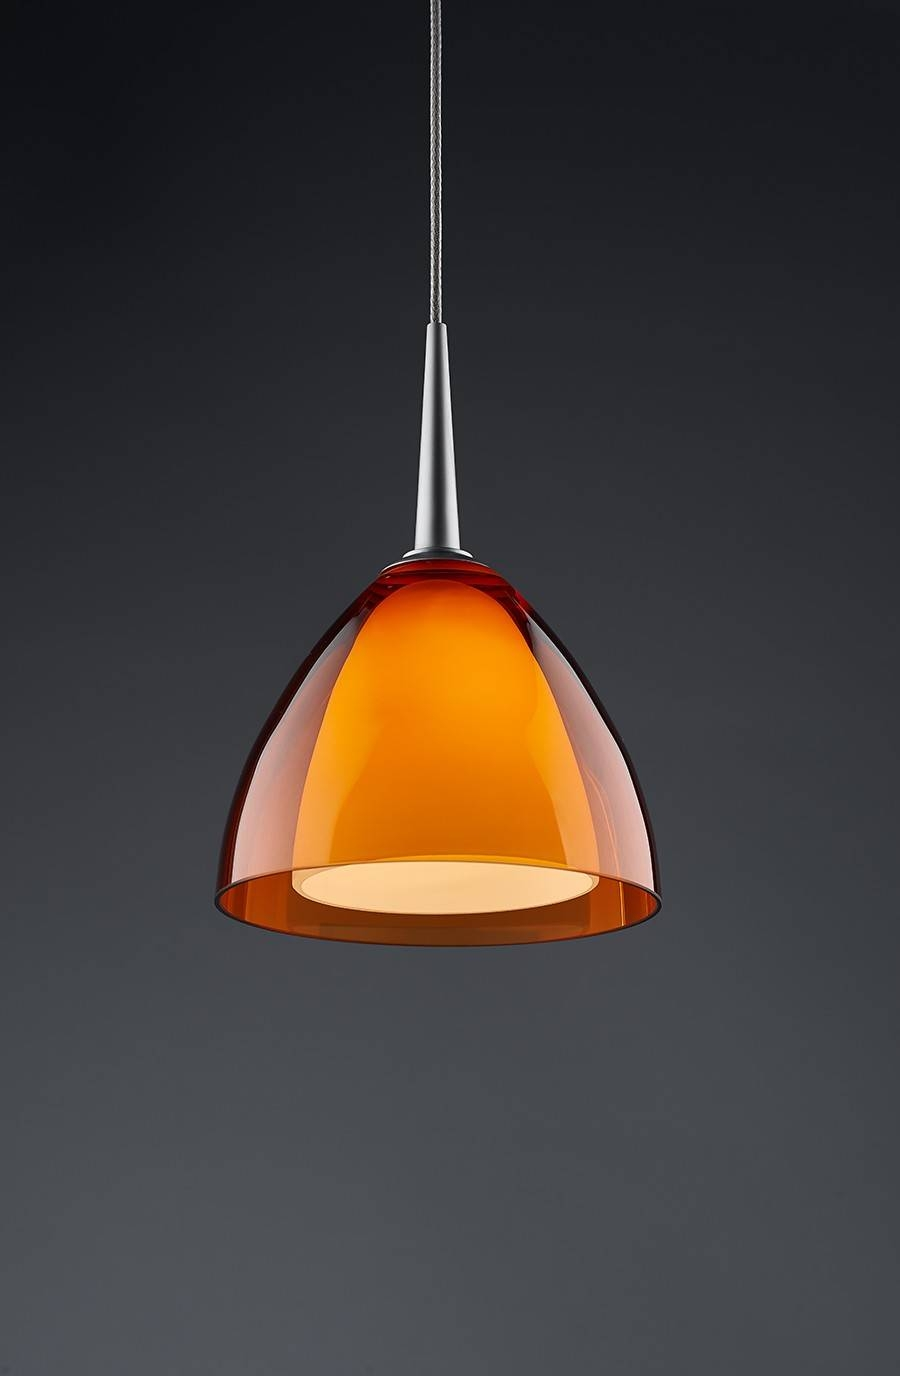 Popular Photo of Orange Glass Pendant Lights